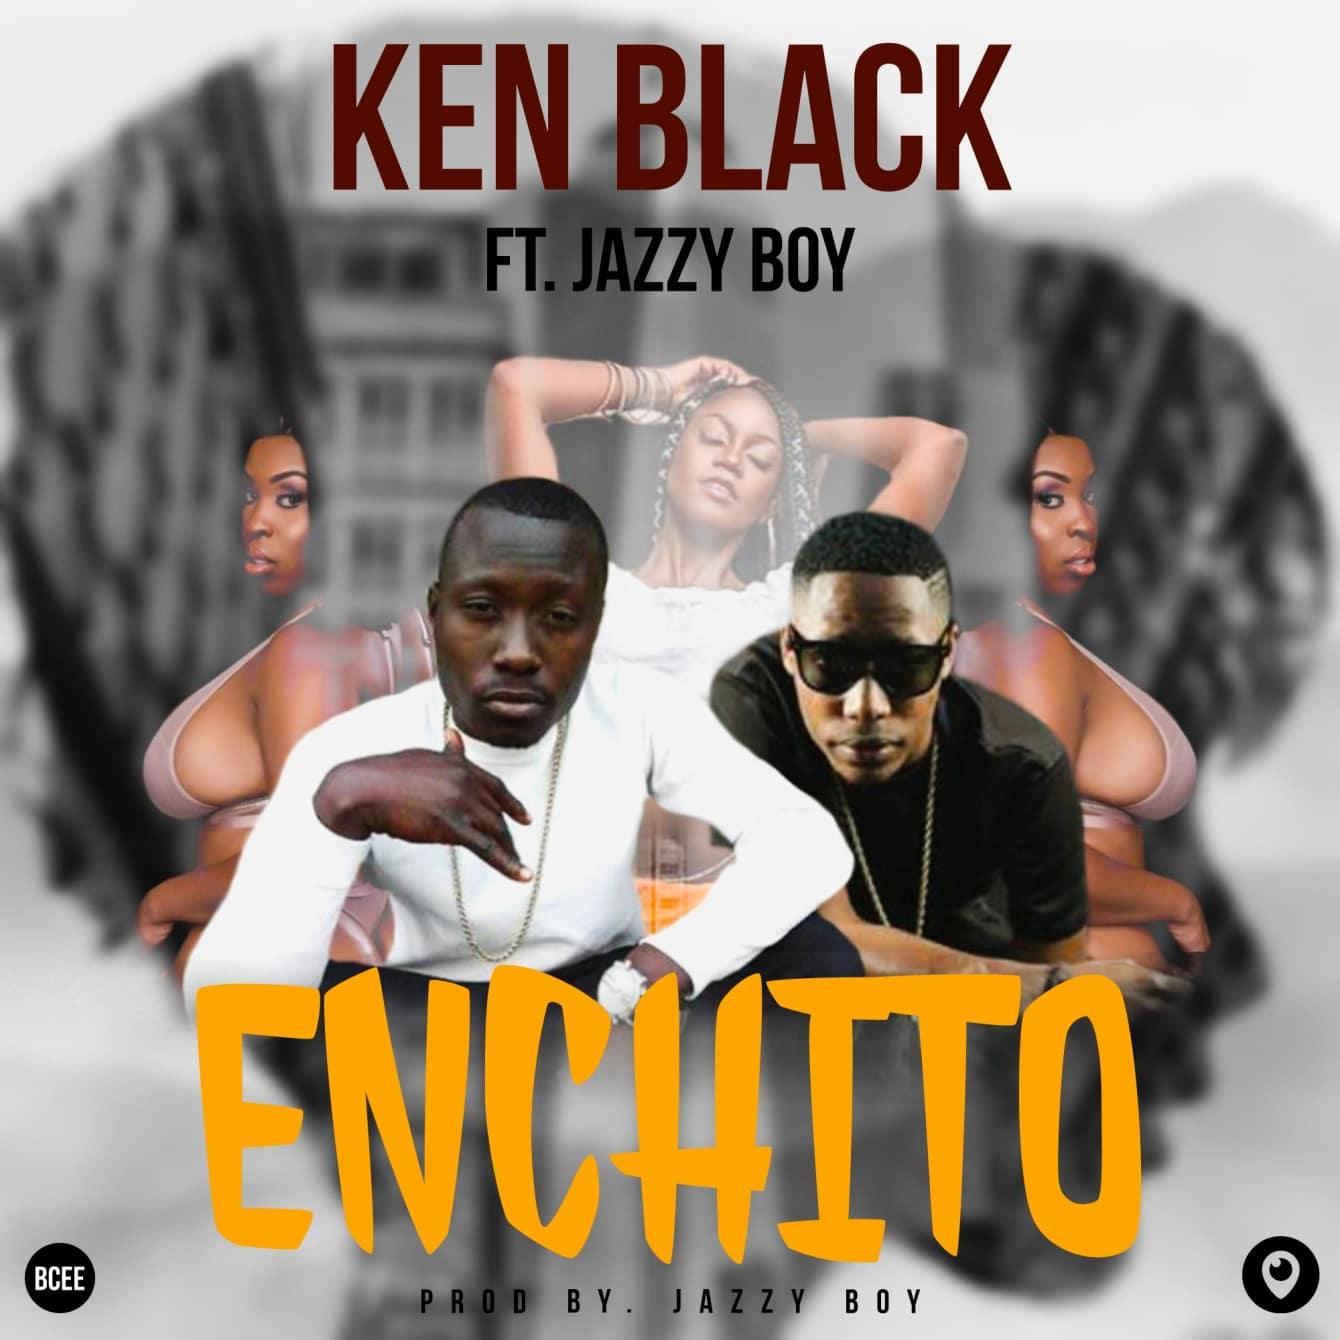 Ken Black Ft. Jazzy Boy Enchito